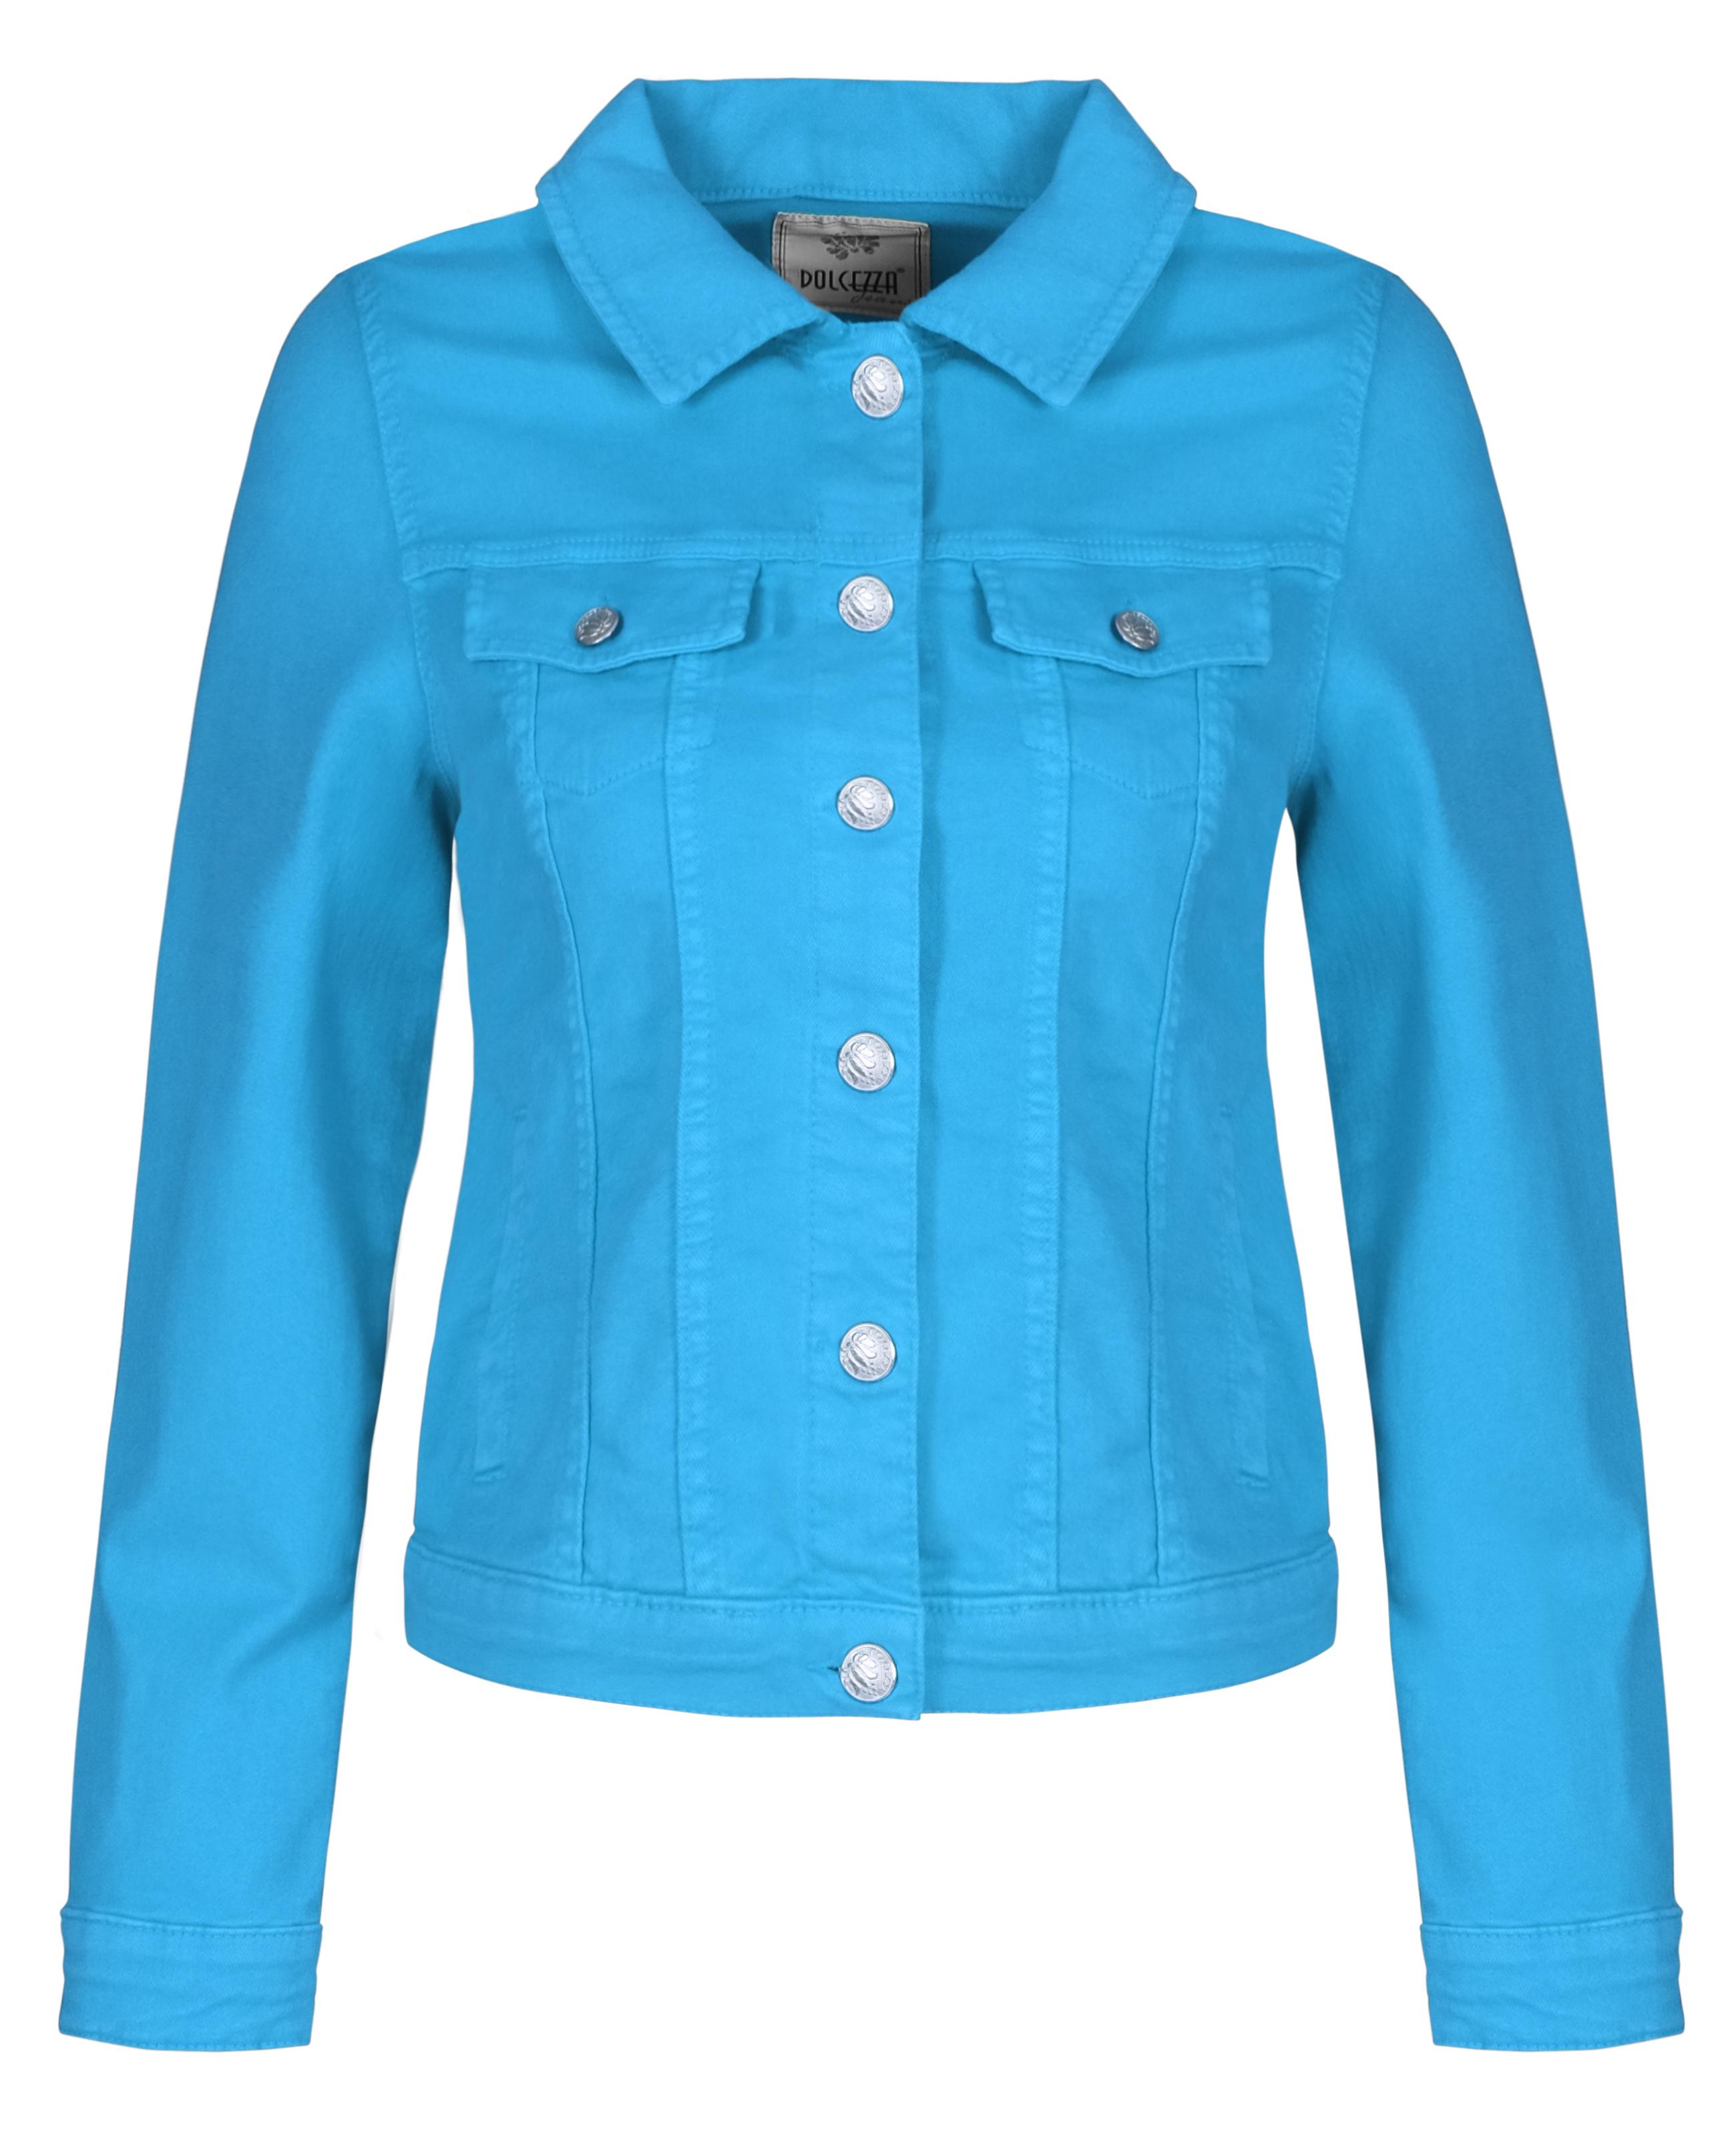 Dolcezza: Relax Me Turquoise Sea Soft Denim Jacket (1 Left!) Dolcezza_21200